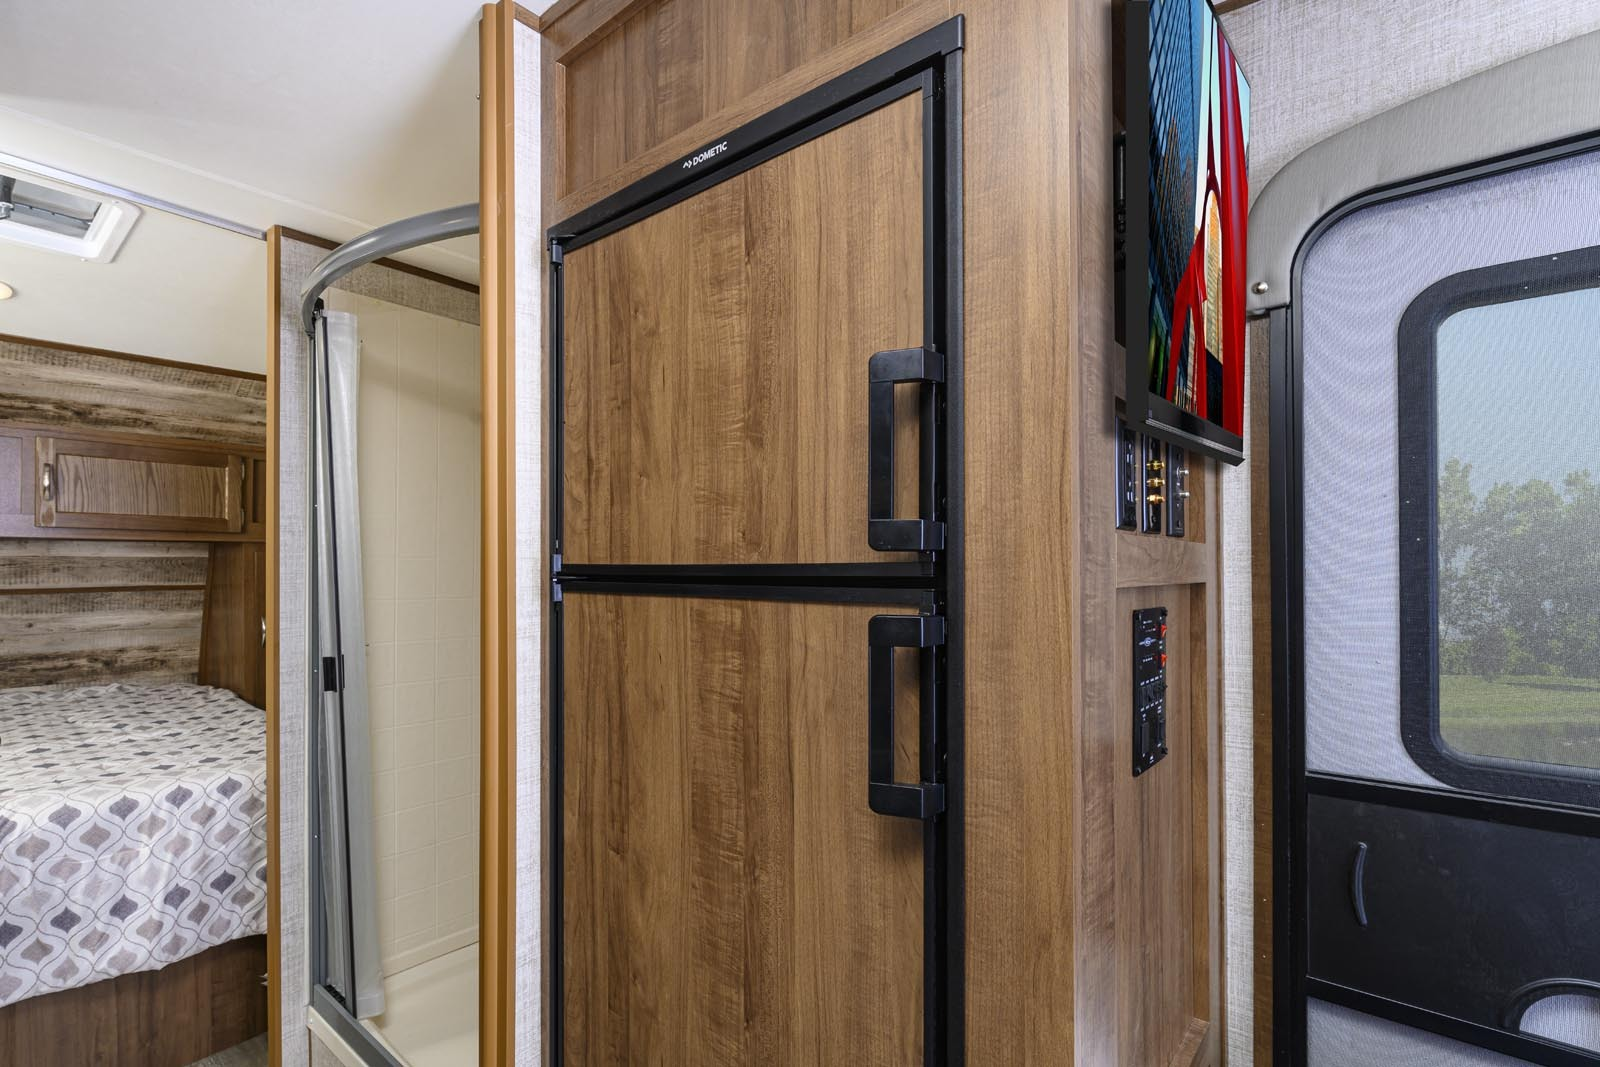 21 19erd vc fridge